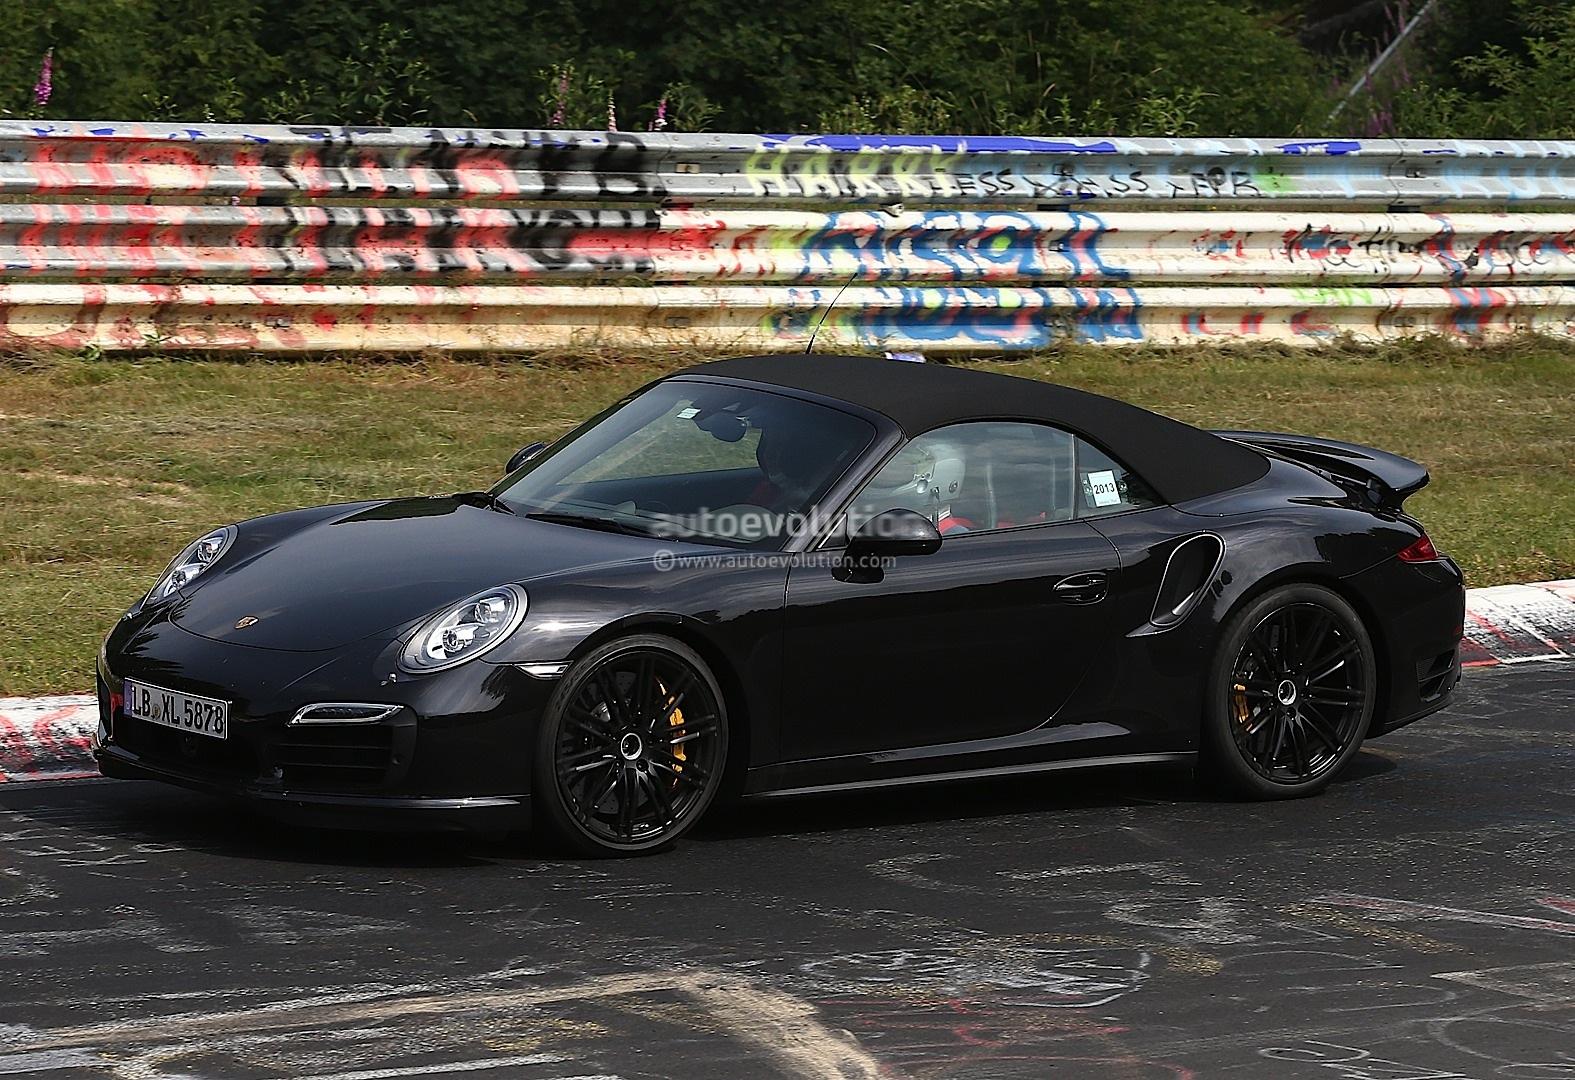 spyshots 2014 porsche 911 turbo cabriolet laps the nurburgring autoevolution. Black Bedroom Furniture Sets. Home Design Ideas